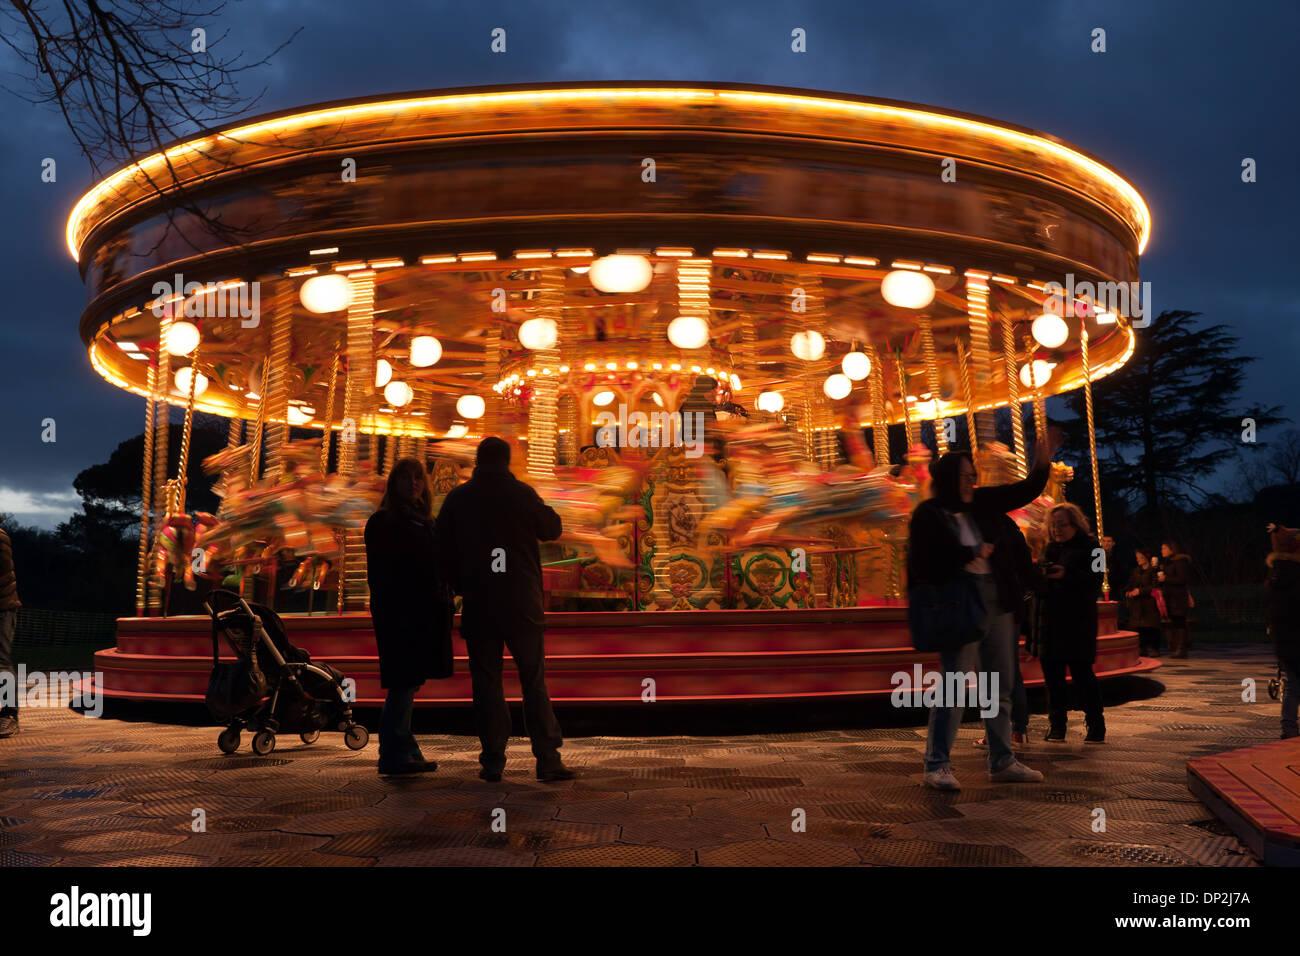 Nightime image of a Fairground Carousel. in Kew Gardens, Kew, London. - Stock Image